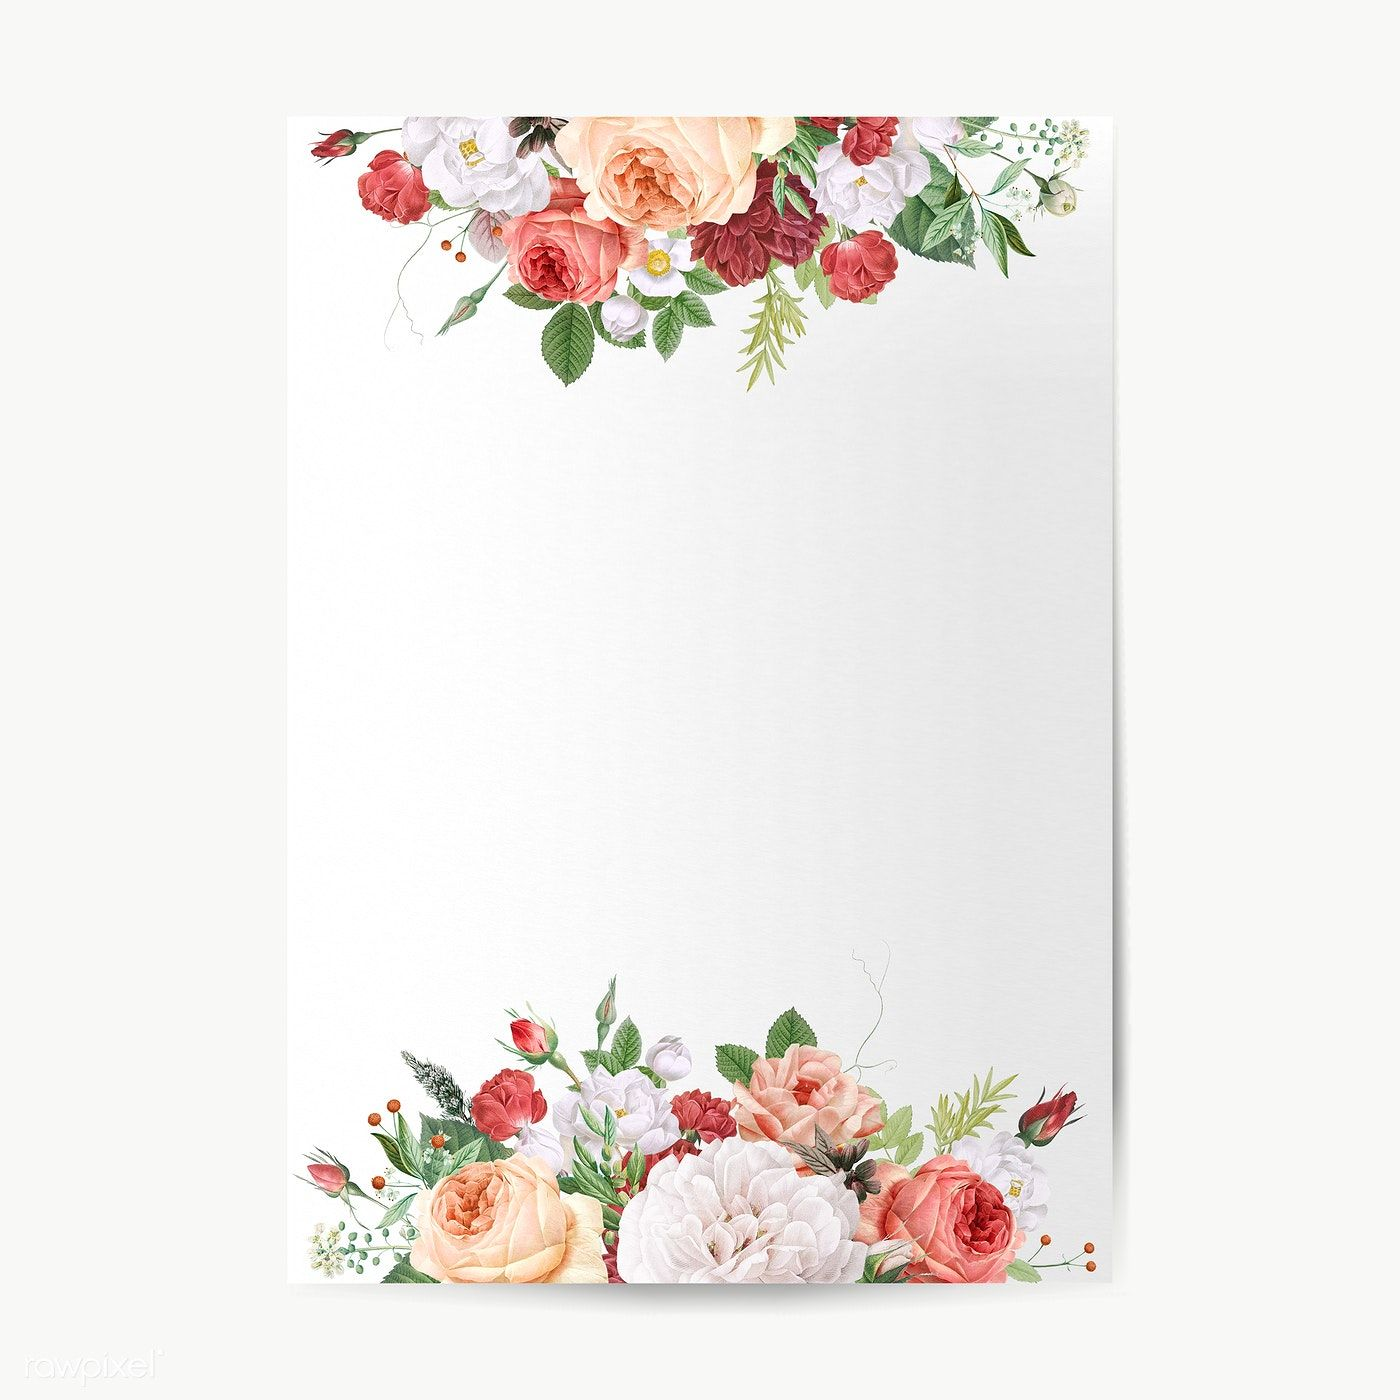 Download premium png of Floral wedding invitation mockup